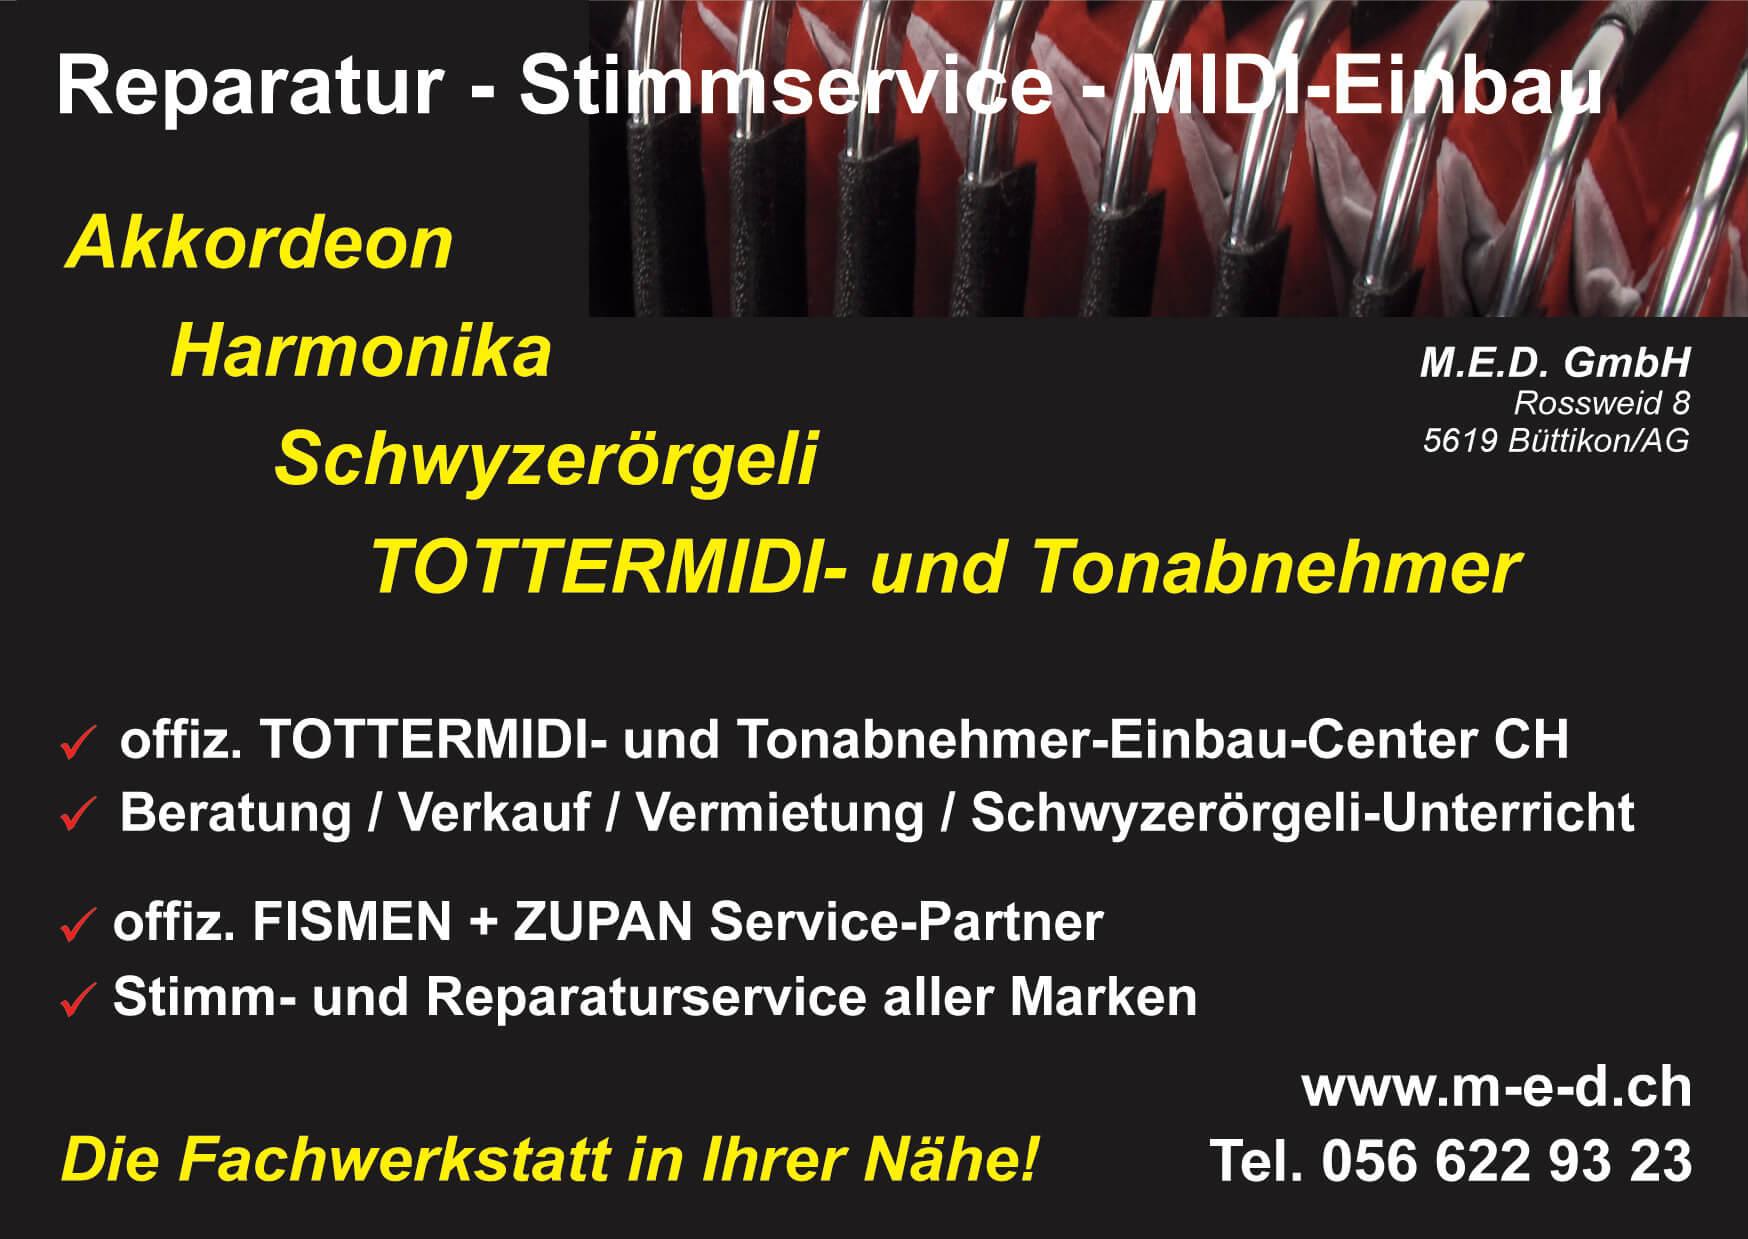 M.E.D. GmbH Angebot